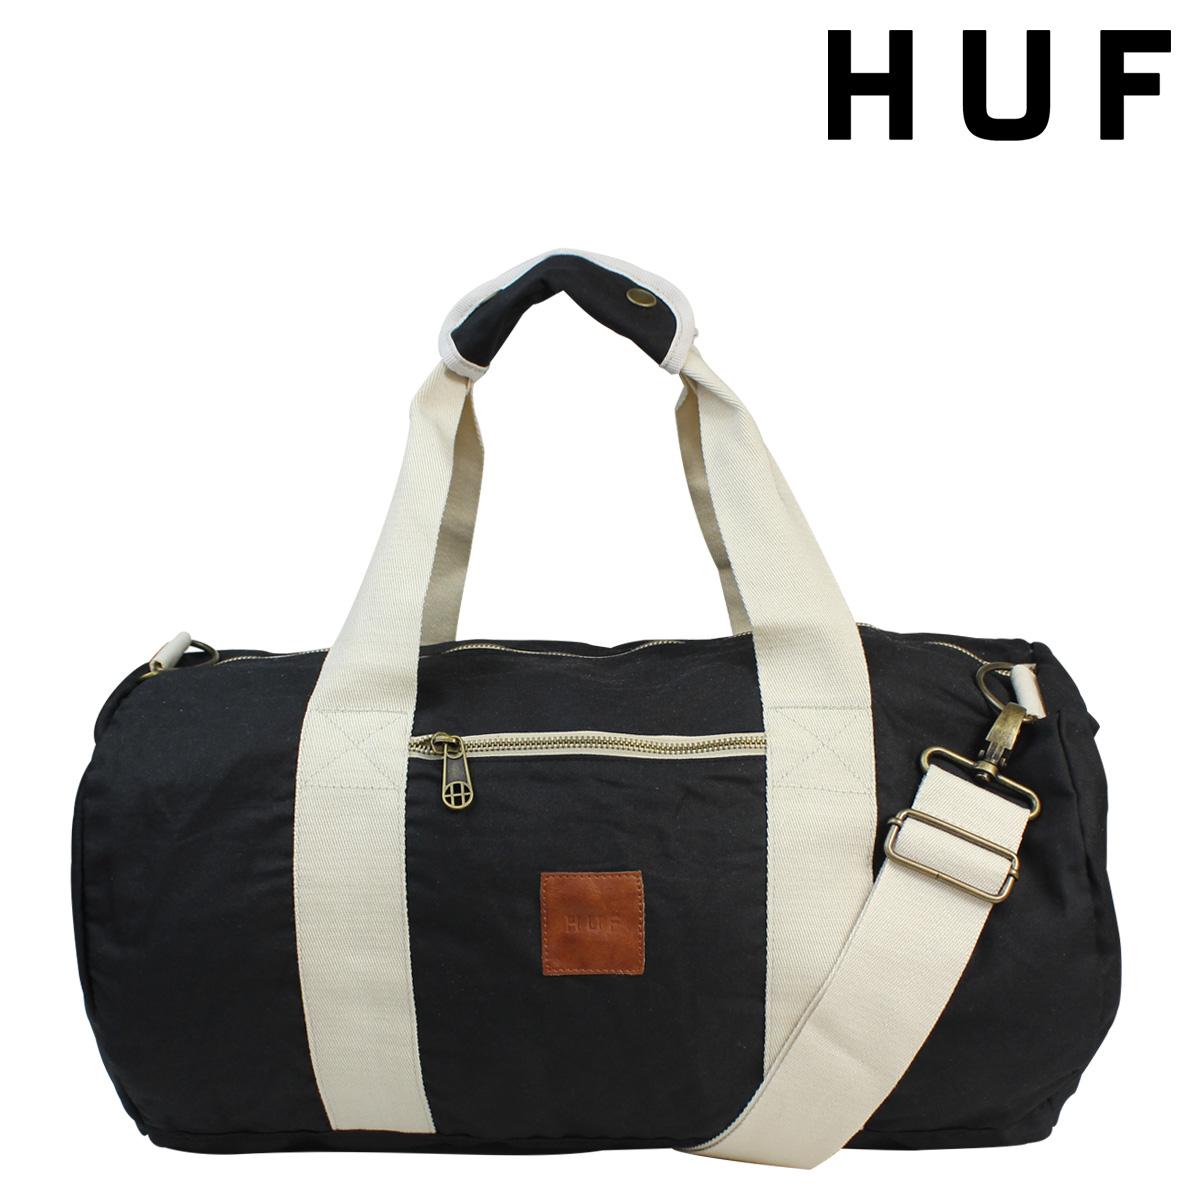 ALLSPORTS   Rakuten Global Market: Hough HUF mens Boston bag ...